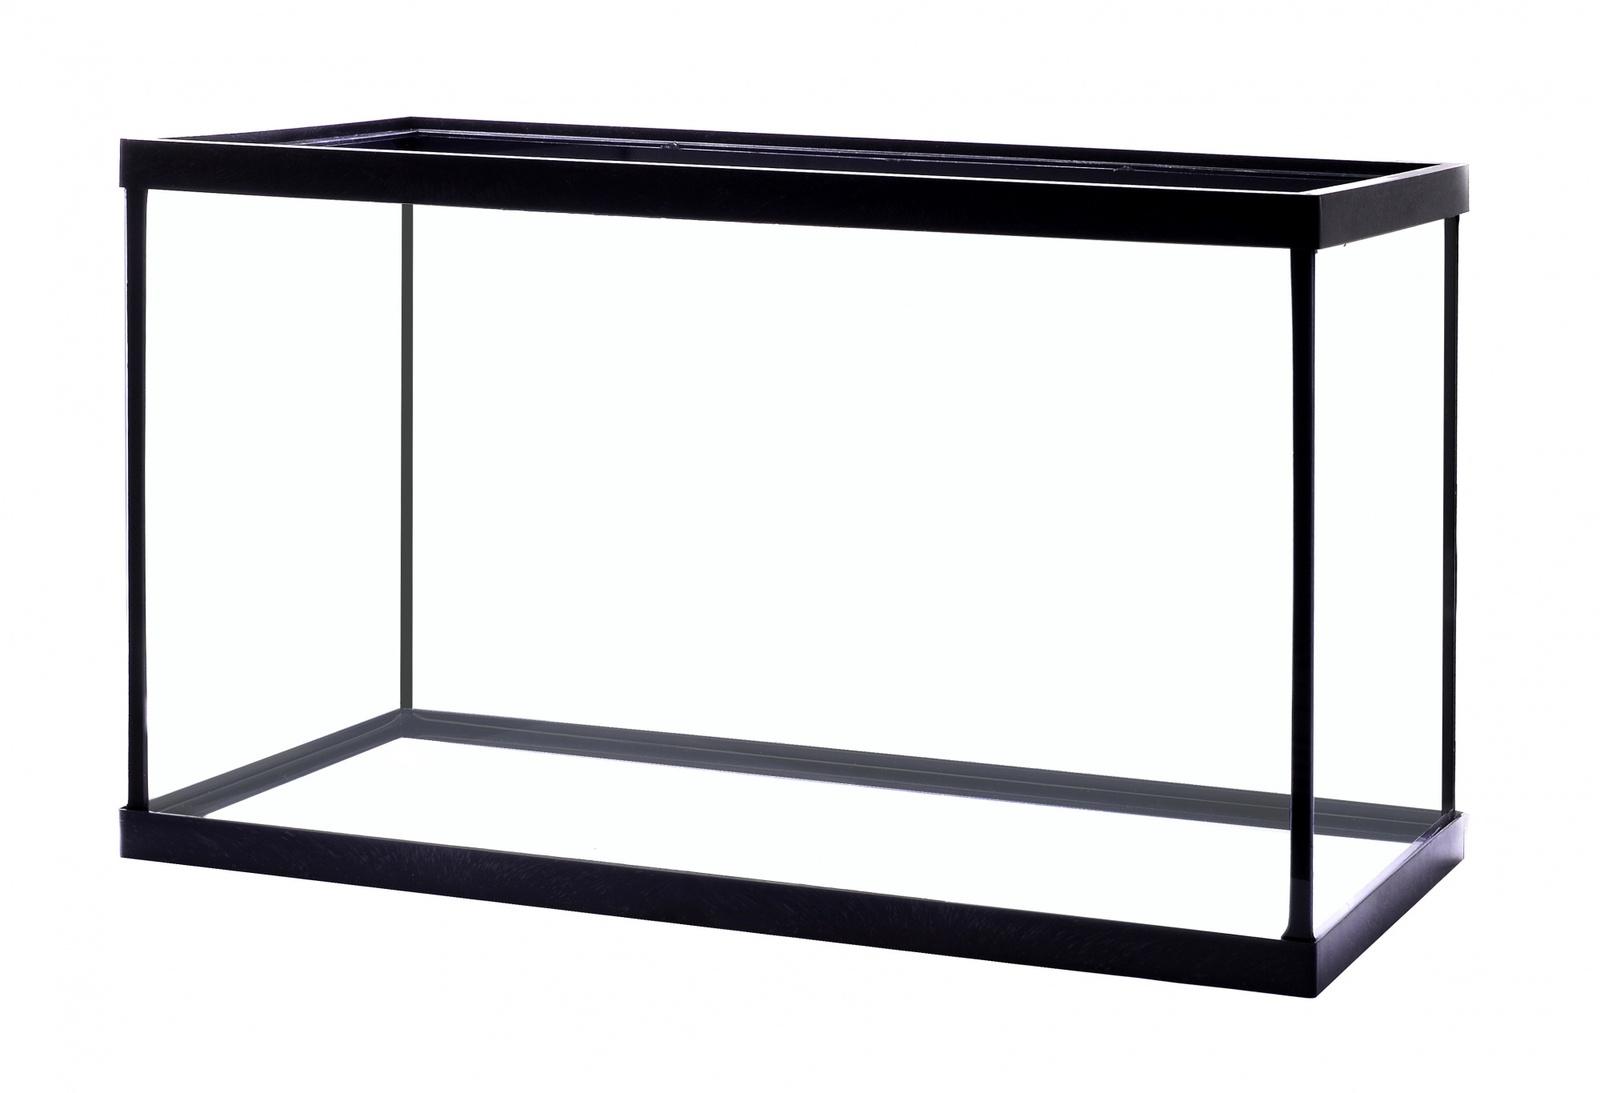 benelux Benelux �������� �������������, 50 * 25 * 30 �� (Glass fish tank L) 4484 50508